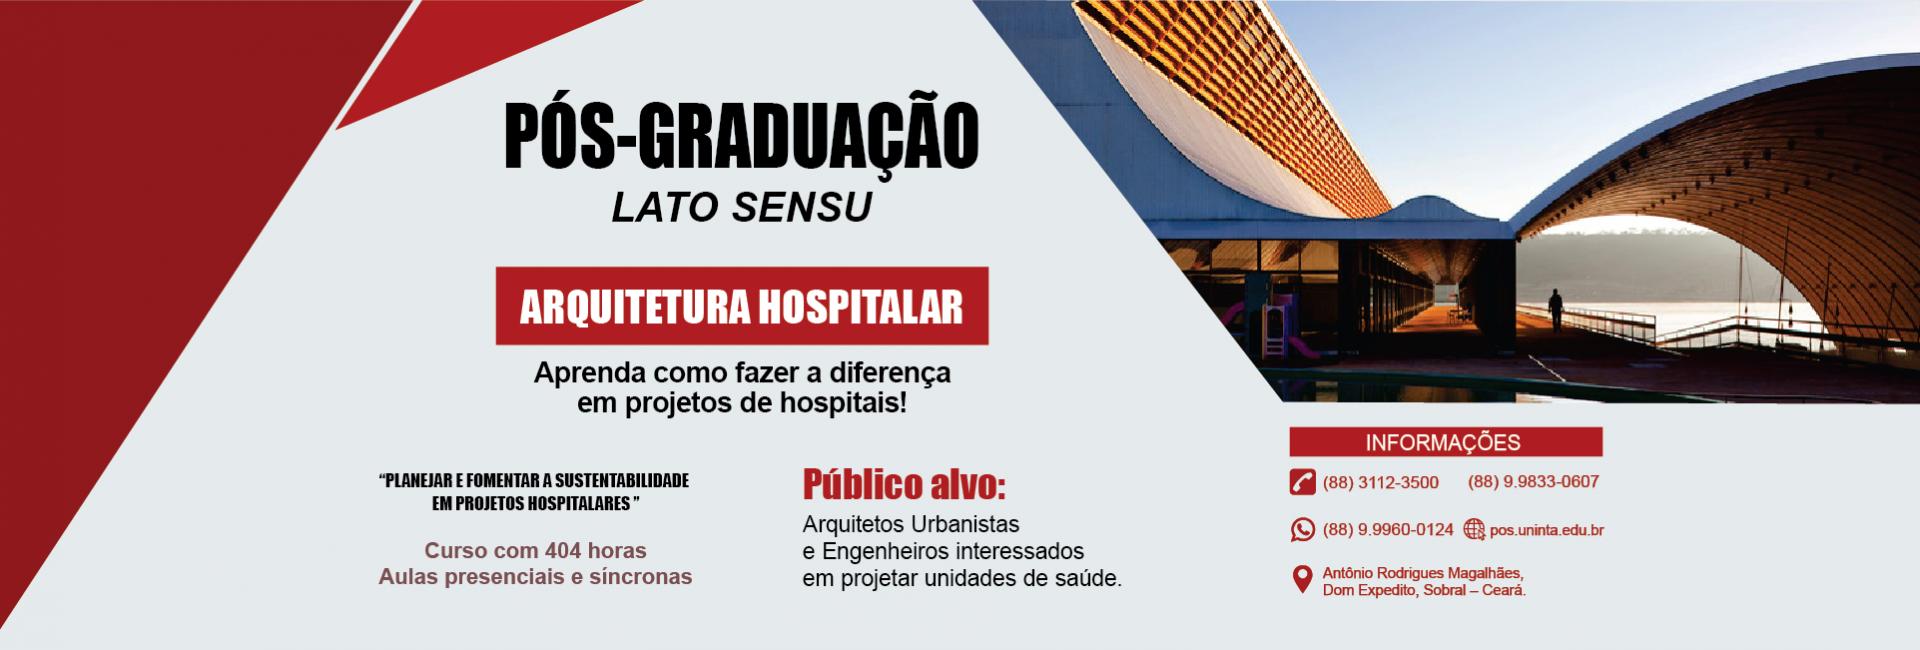 Pós-graduaçãio em Arqitetura Hospitalar